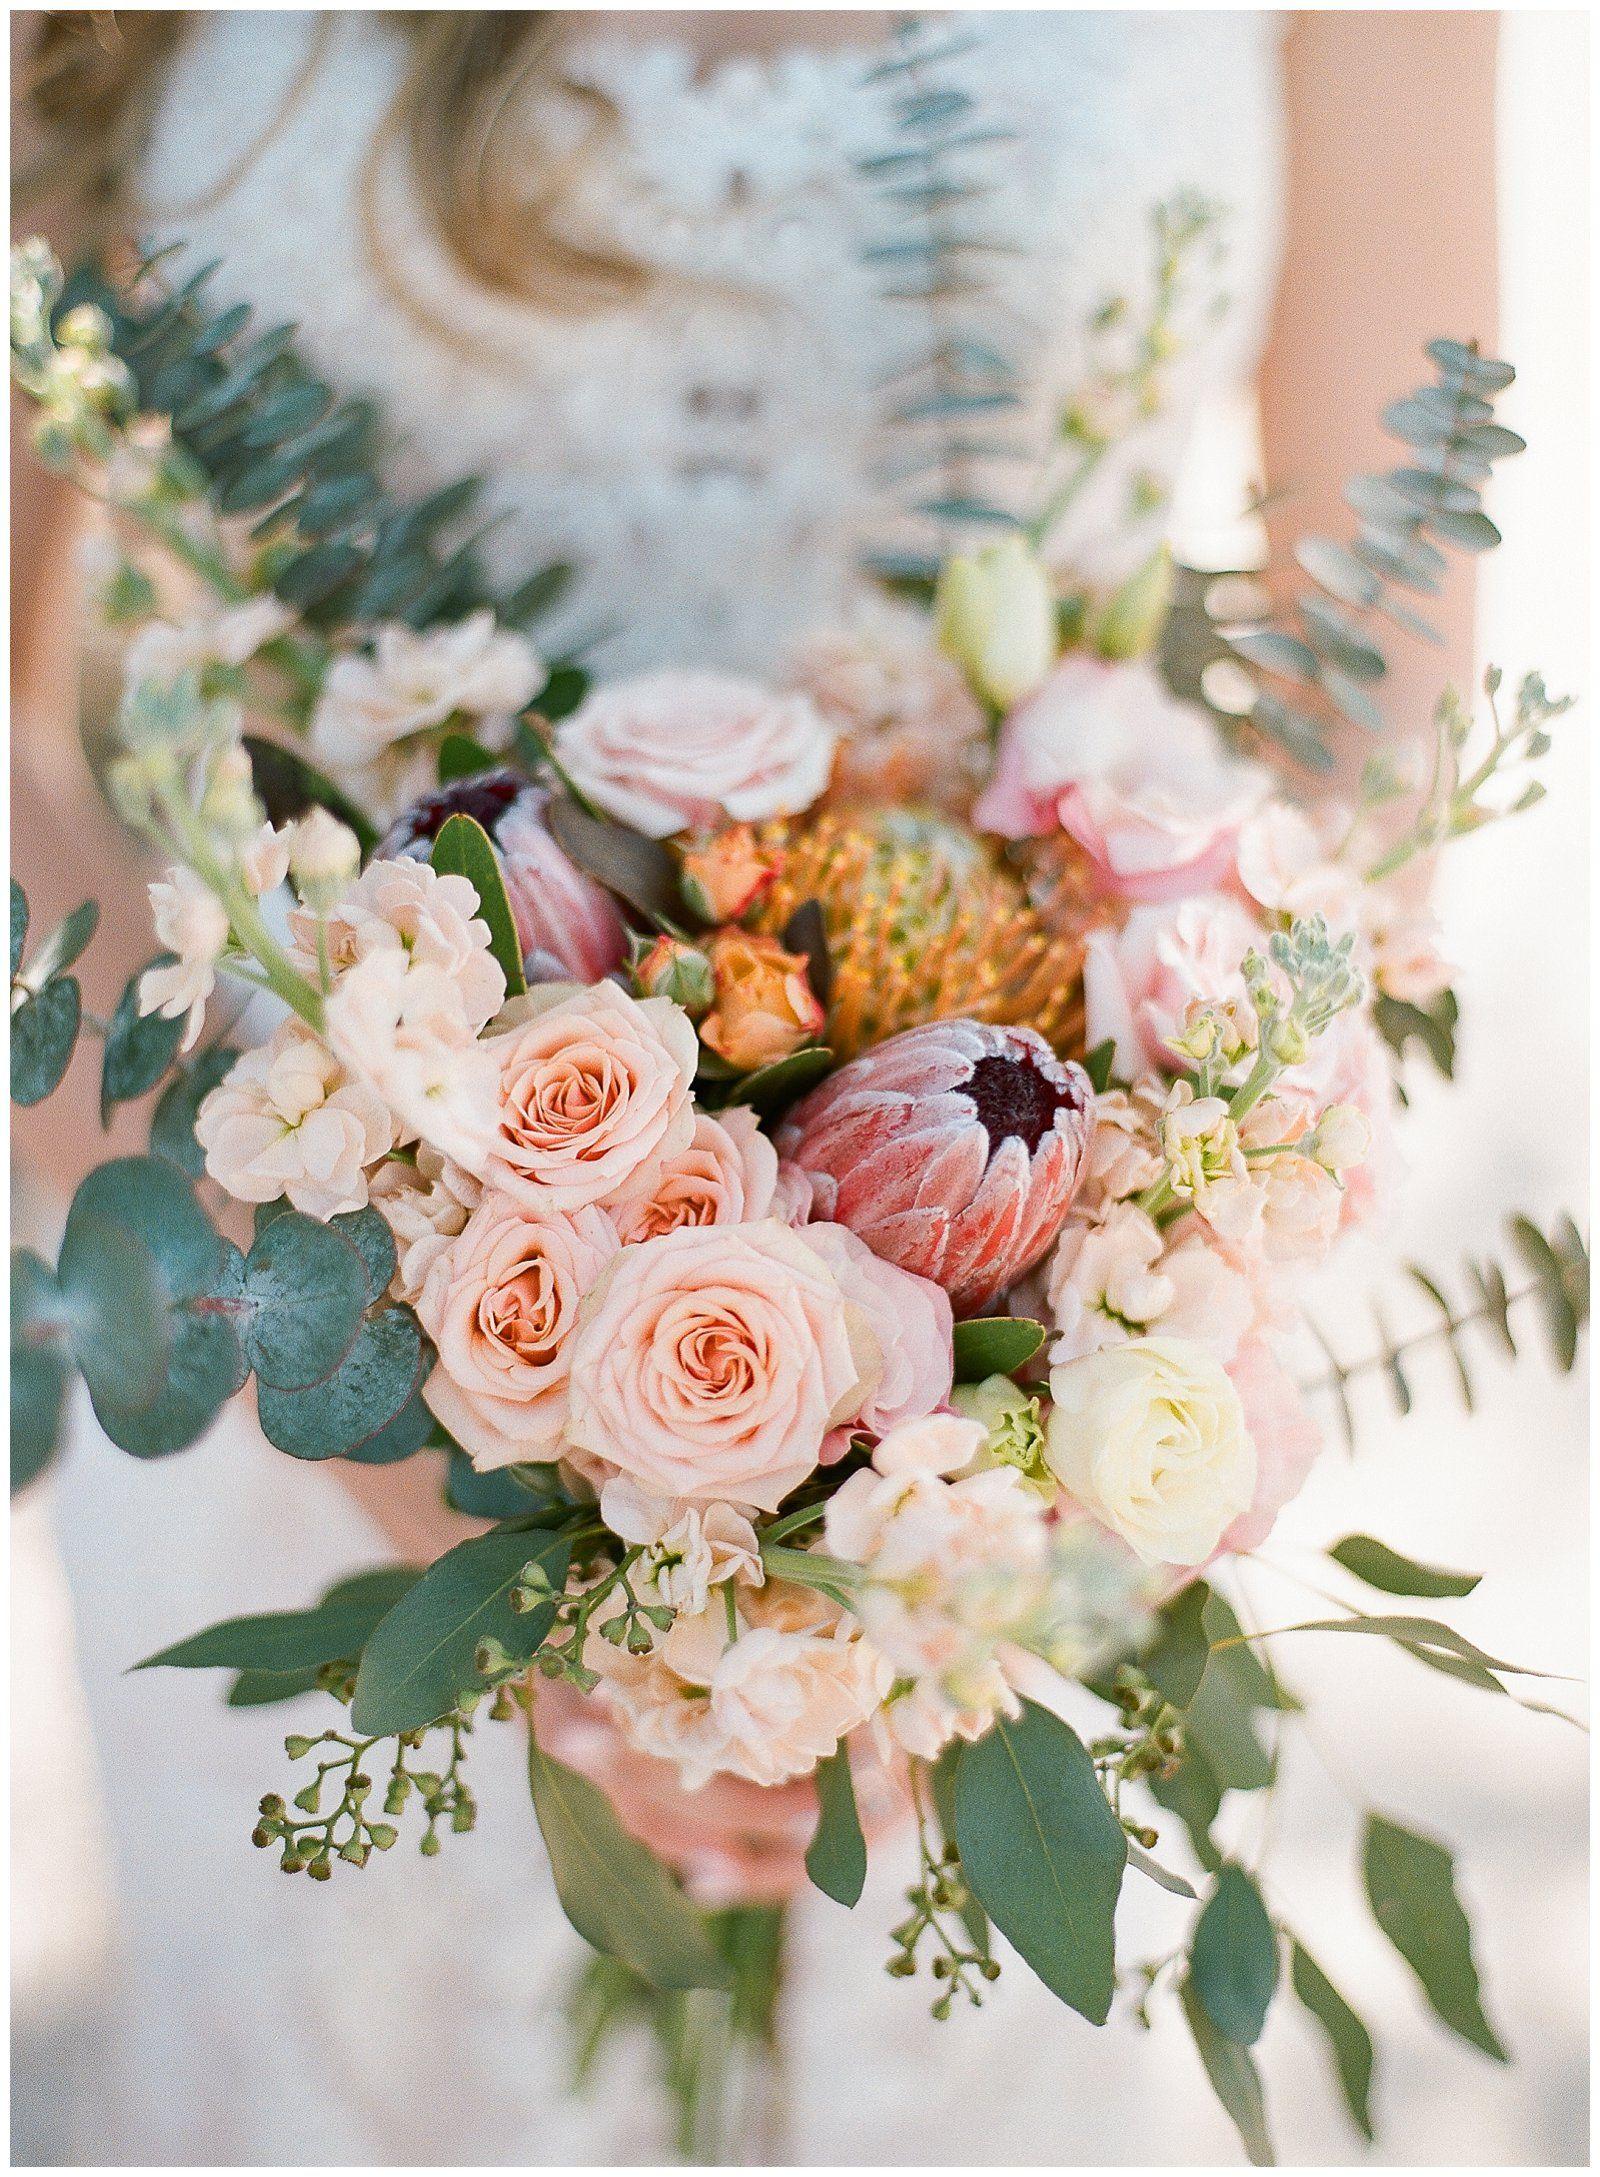 Emilie Cole A Backyard Wedding In St Pete Florida The Ganeys Fine Art Film Wedding Photographers Wedding Bridal Bouquets Wedding Bouquets Flower Bouquet Wedding